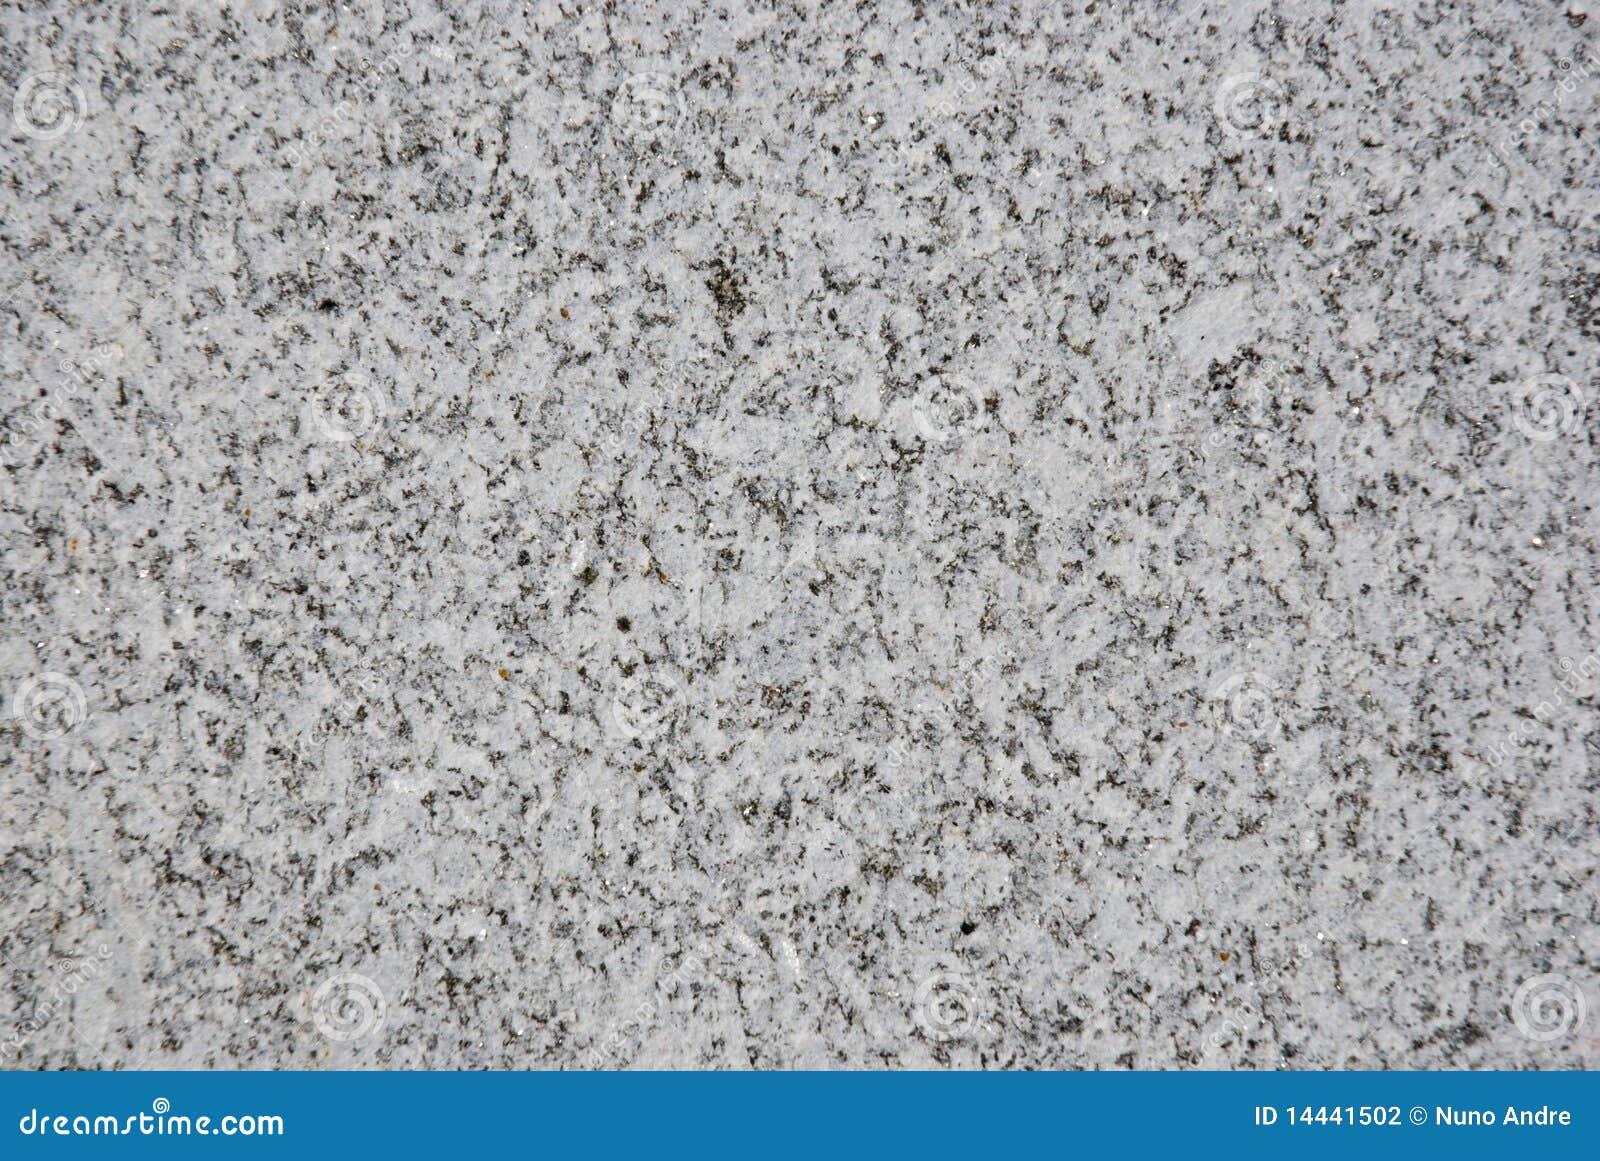 granito pulido fotograf a de archivo imagen 14441502